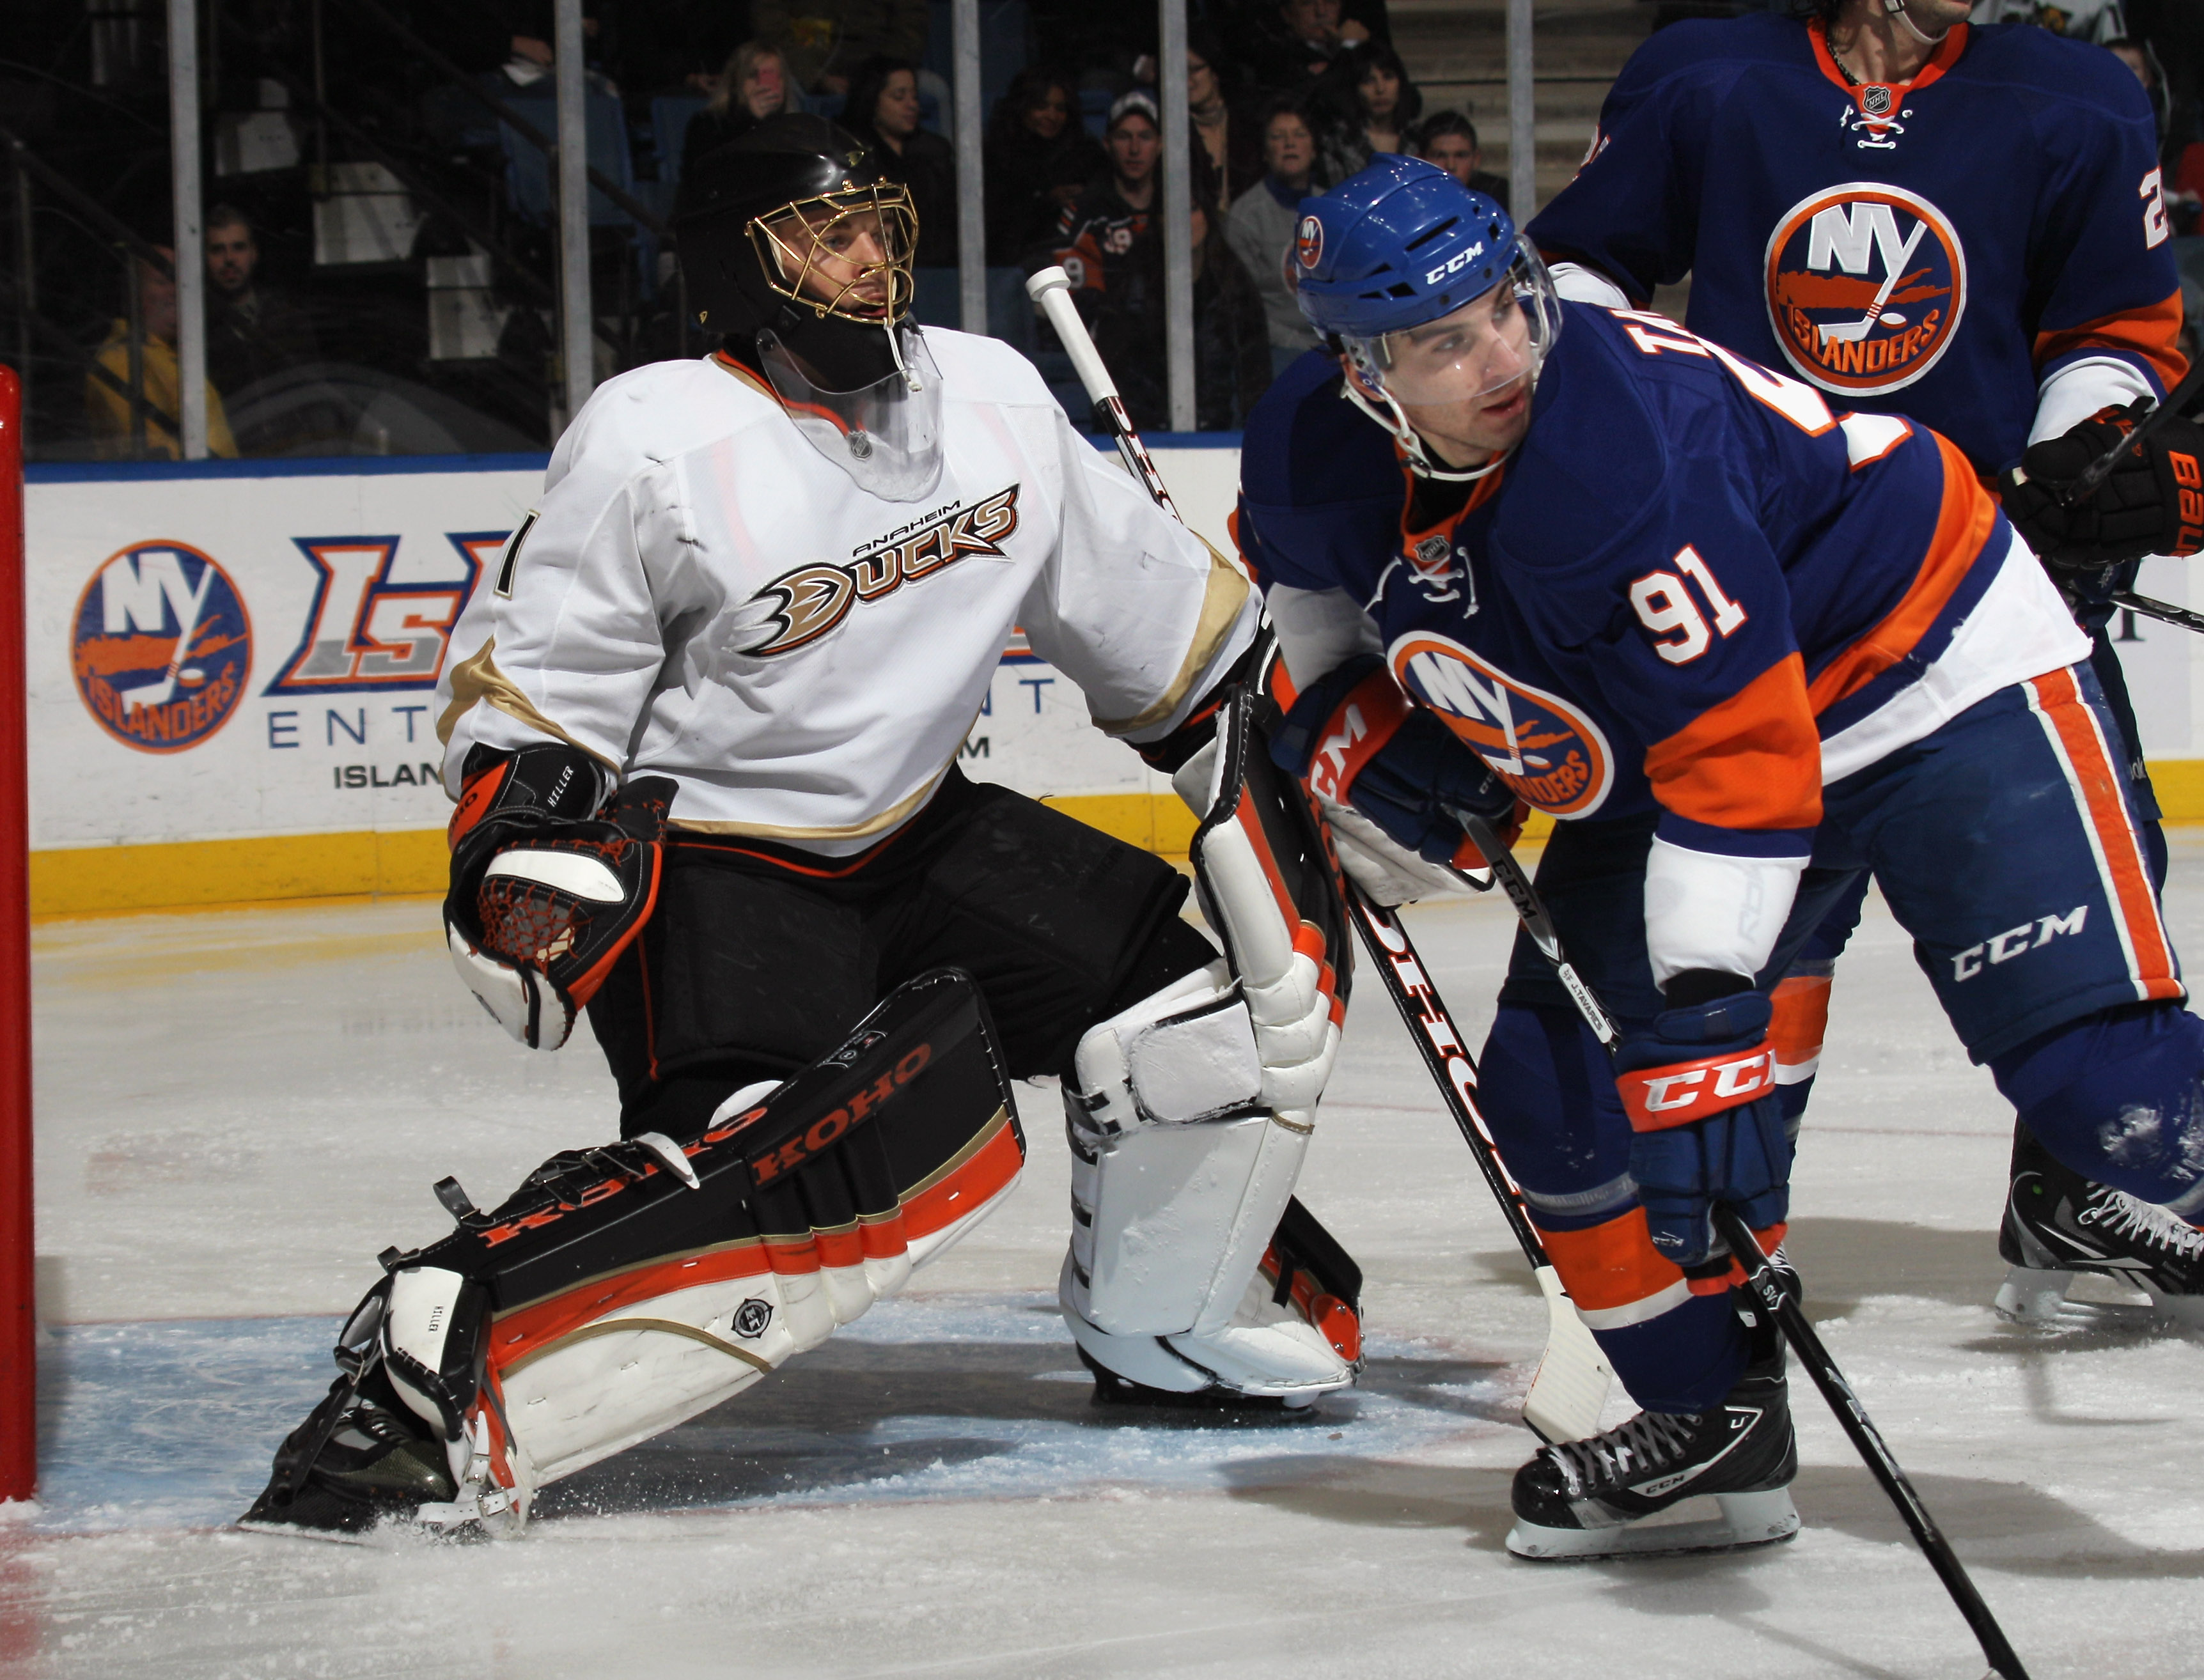 UNIONDALE, NY - DECEMBER 16:  Jonas Hiller #1 of the Anaheim Ducks tends net against John Tavares #91 of the New York Islanders the New York Islanders at the Nassau Coliseum on December 16, 2010 in Uniondale, New York.  (Photo by Bruce Bennett/Getty Image